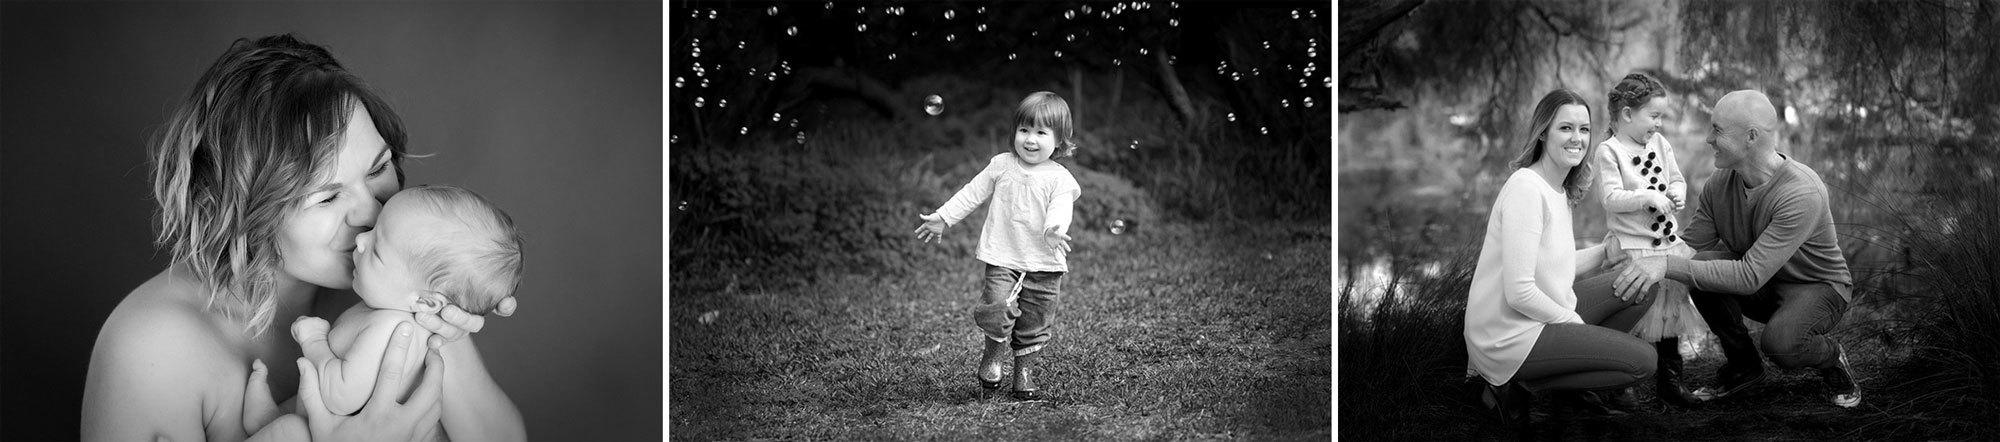 newborn-photography-perth-family-photography-perth